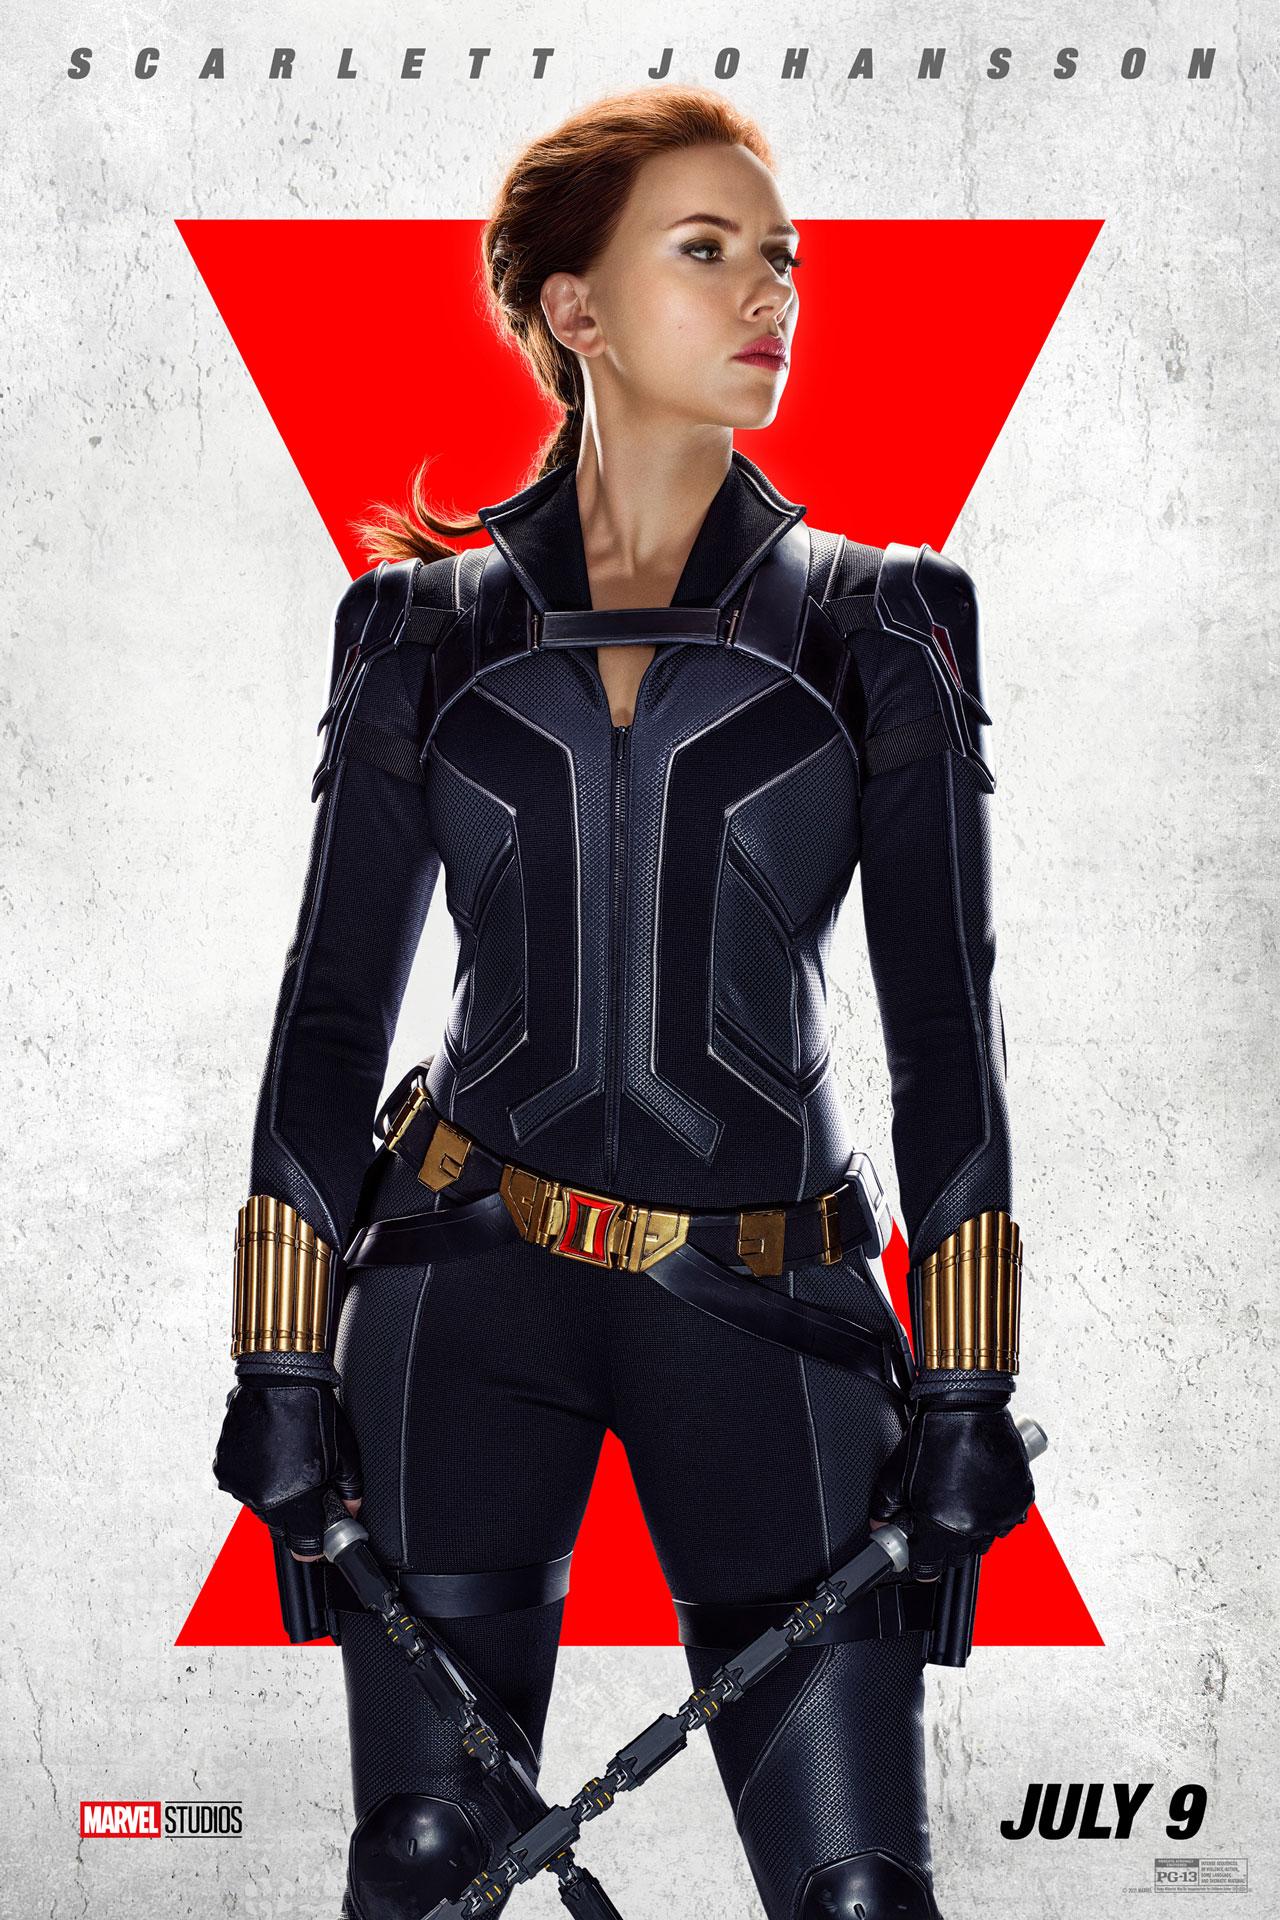 Marvel 之 MCU 第四阶段英雄大片《黑寡妇 Black Widow》角色海报曝光